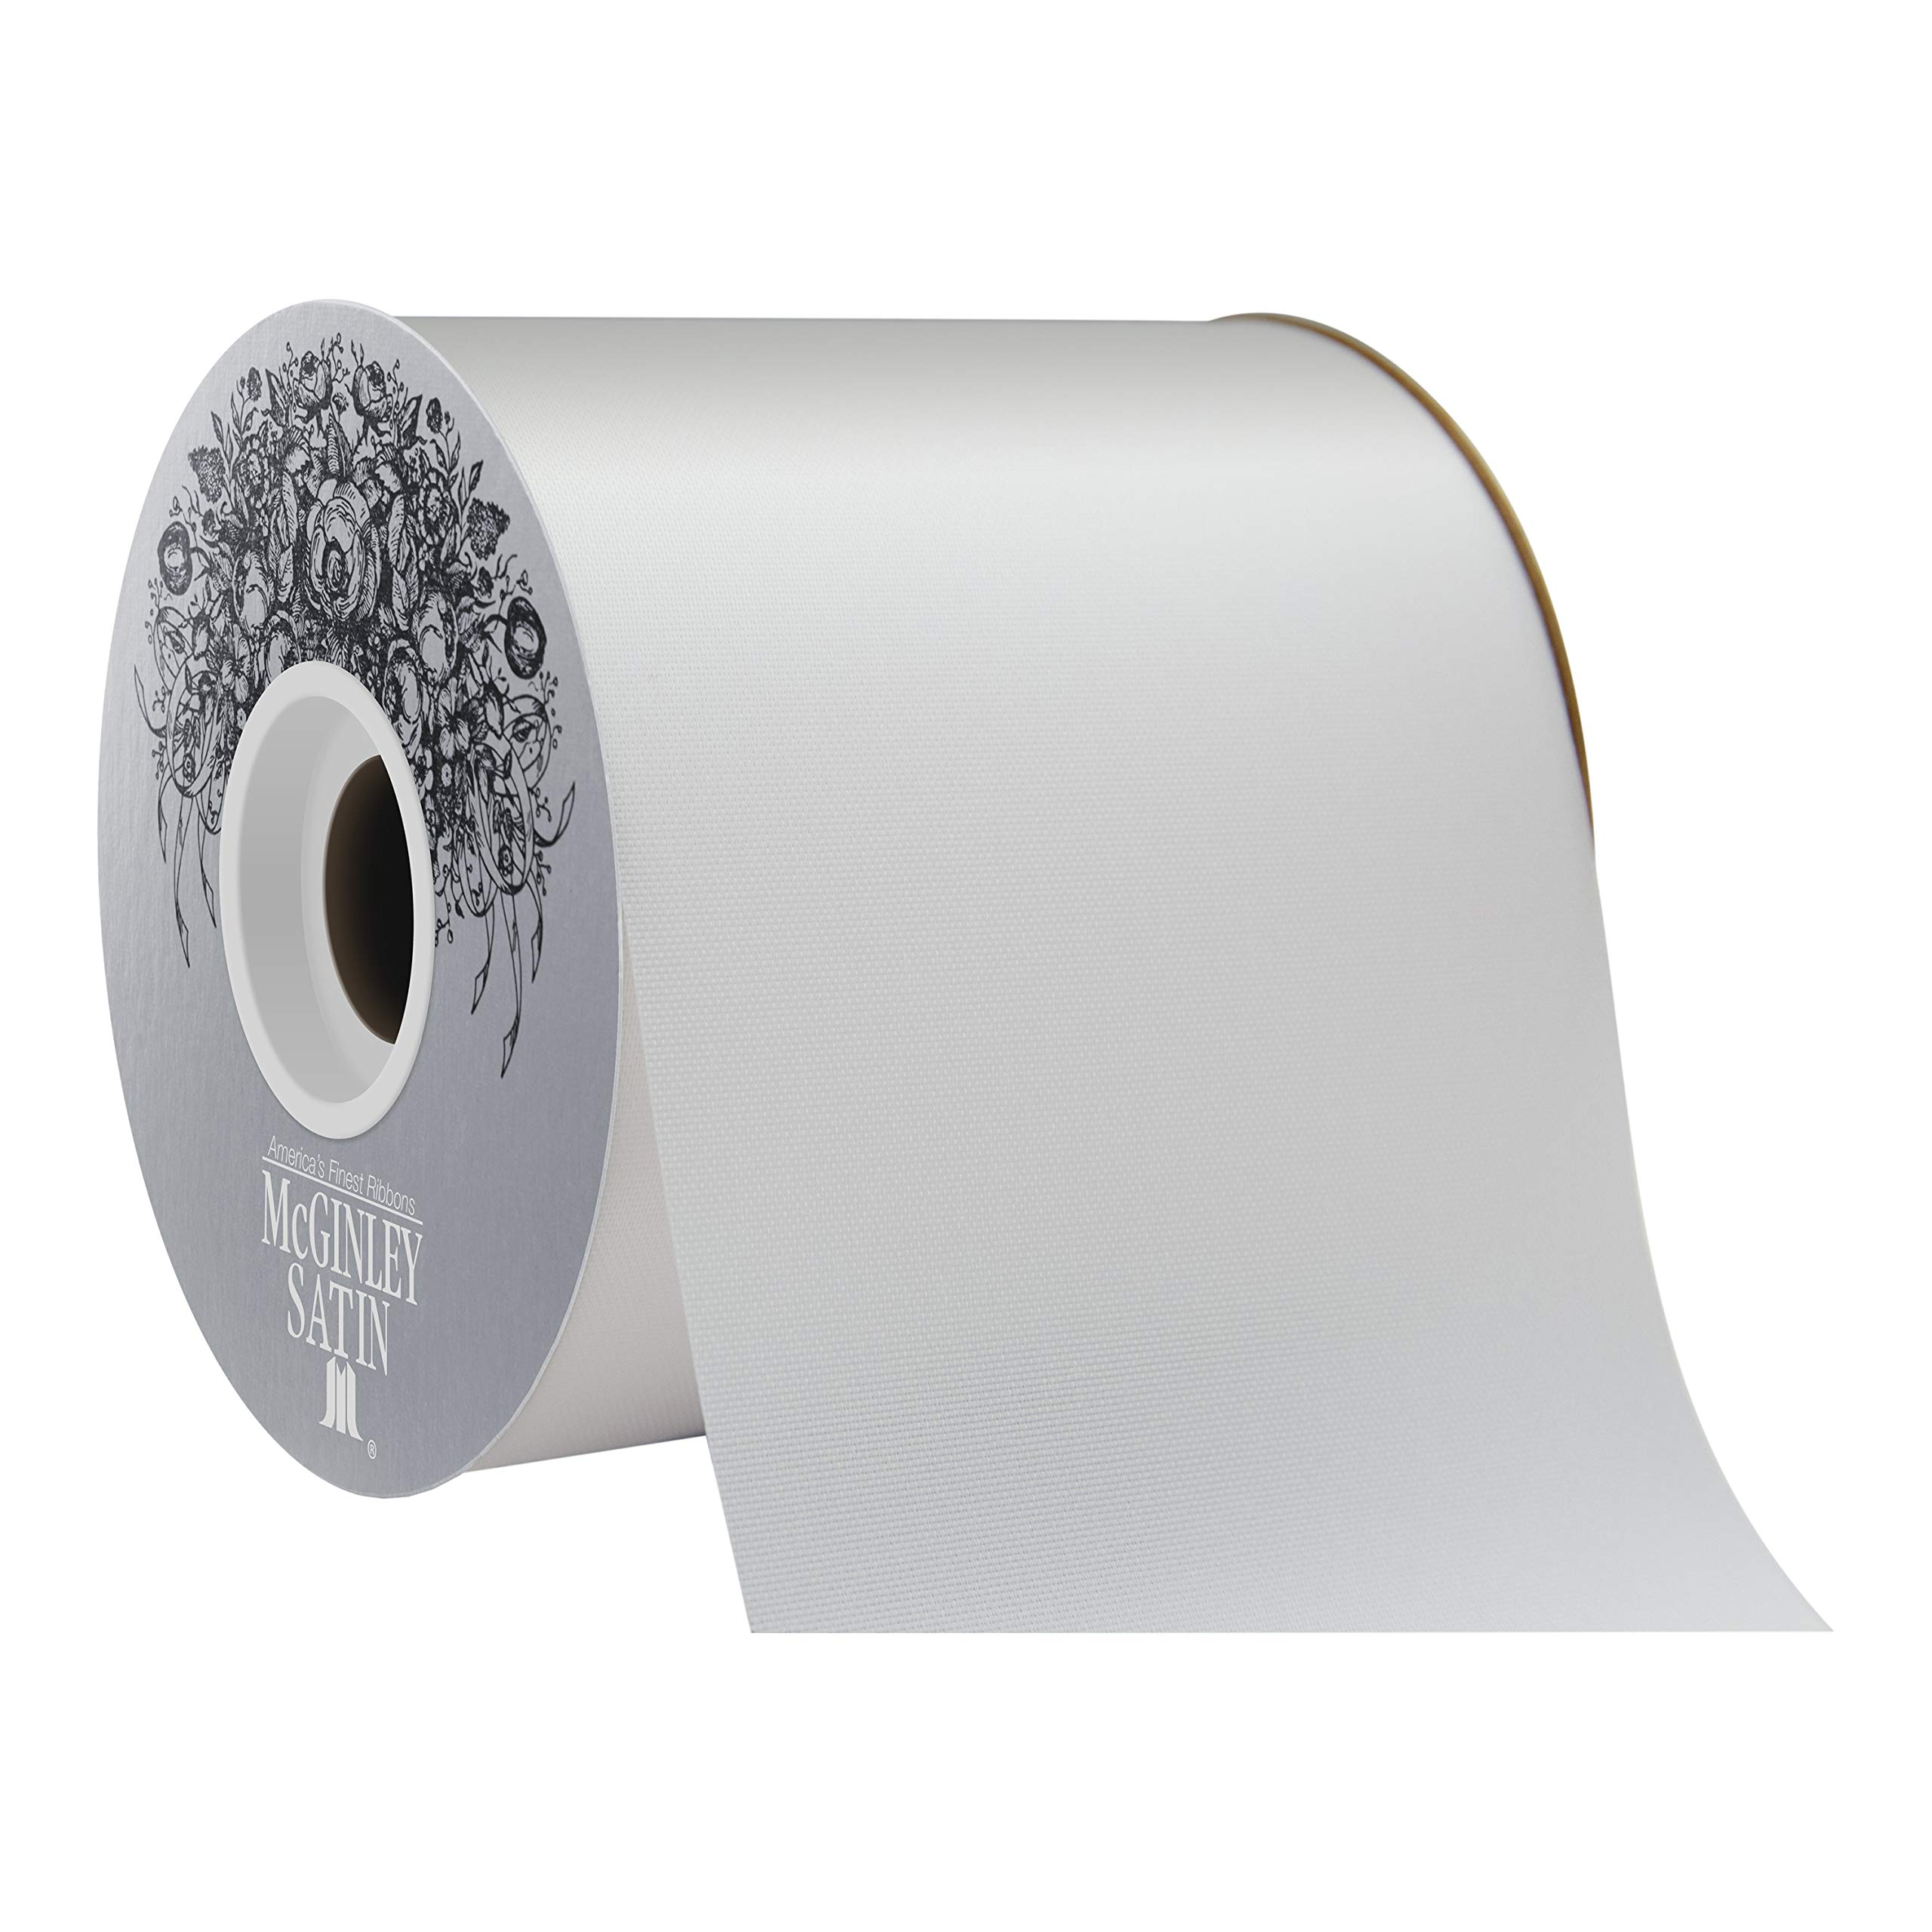 McGinley Mills 4'' W Acetate Satin Ribbon, White, 50 Yard Spool